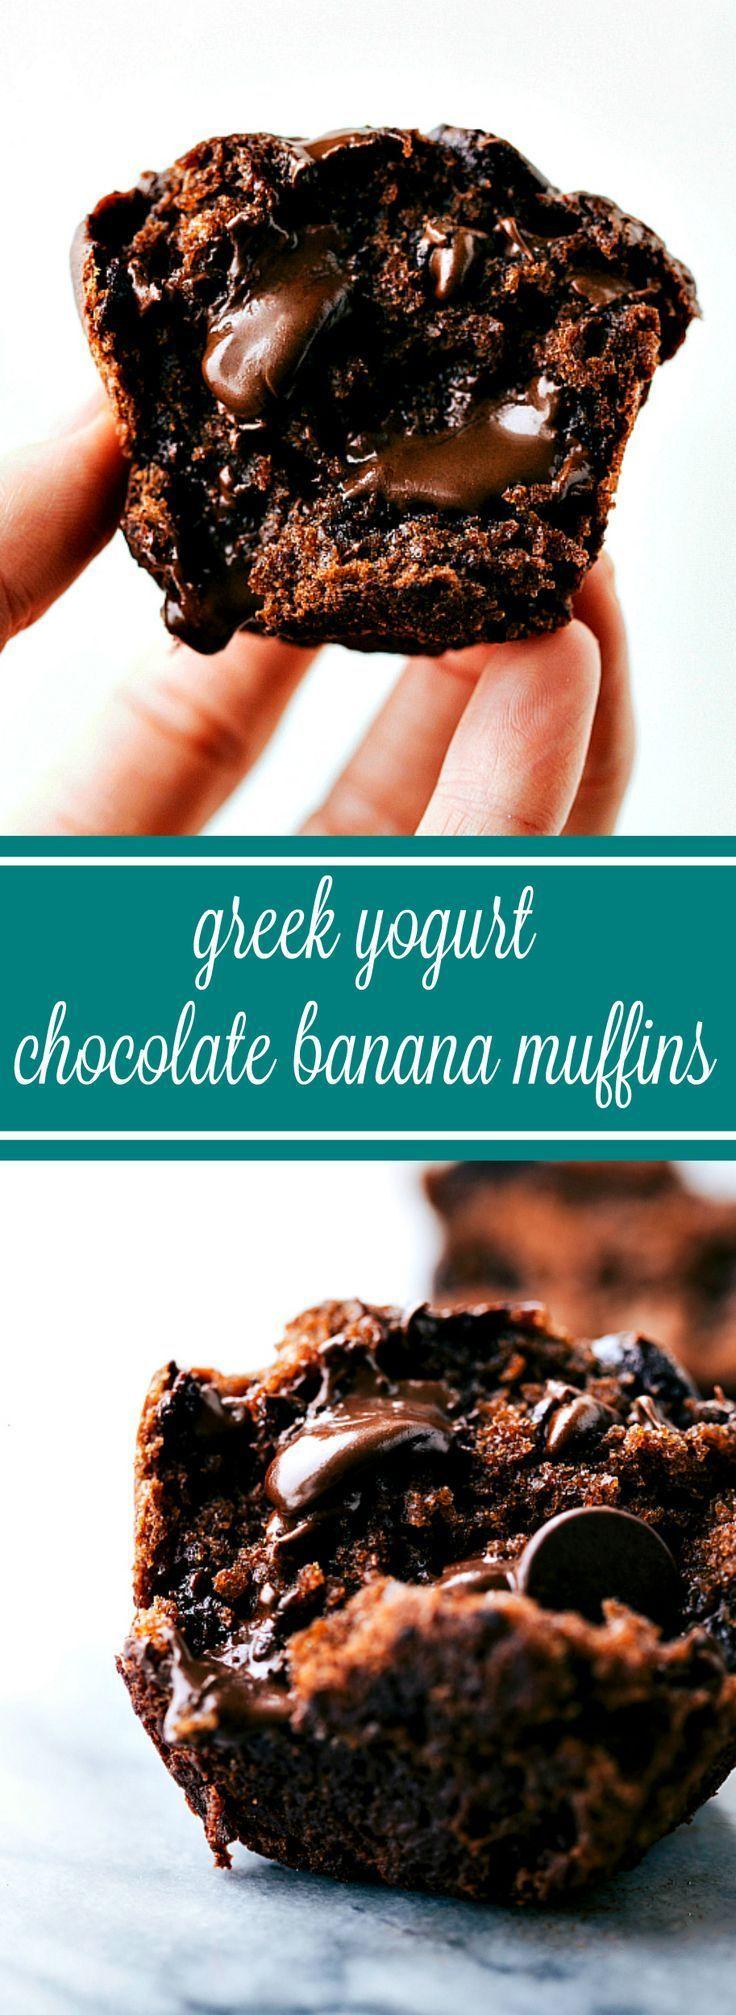 Delicious bakery style greek yogurt chocolate banana